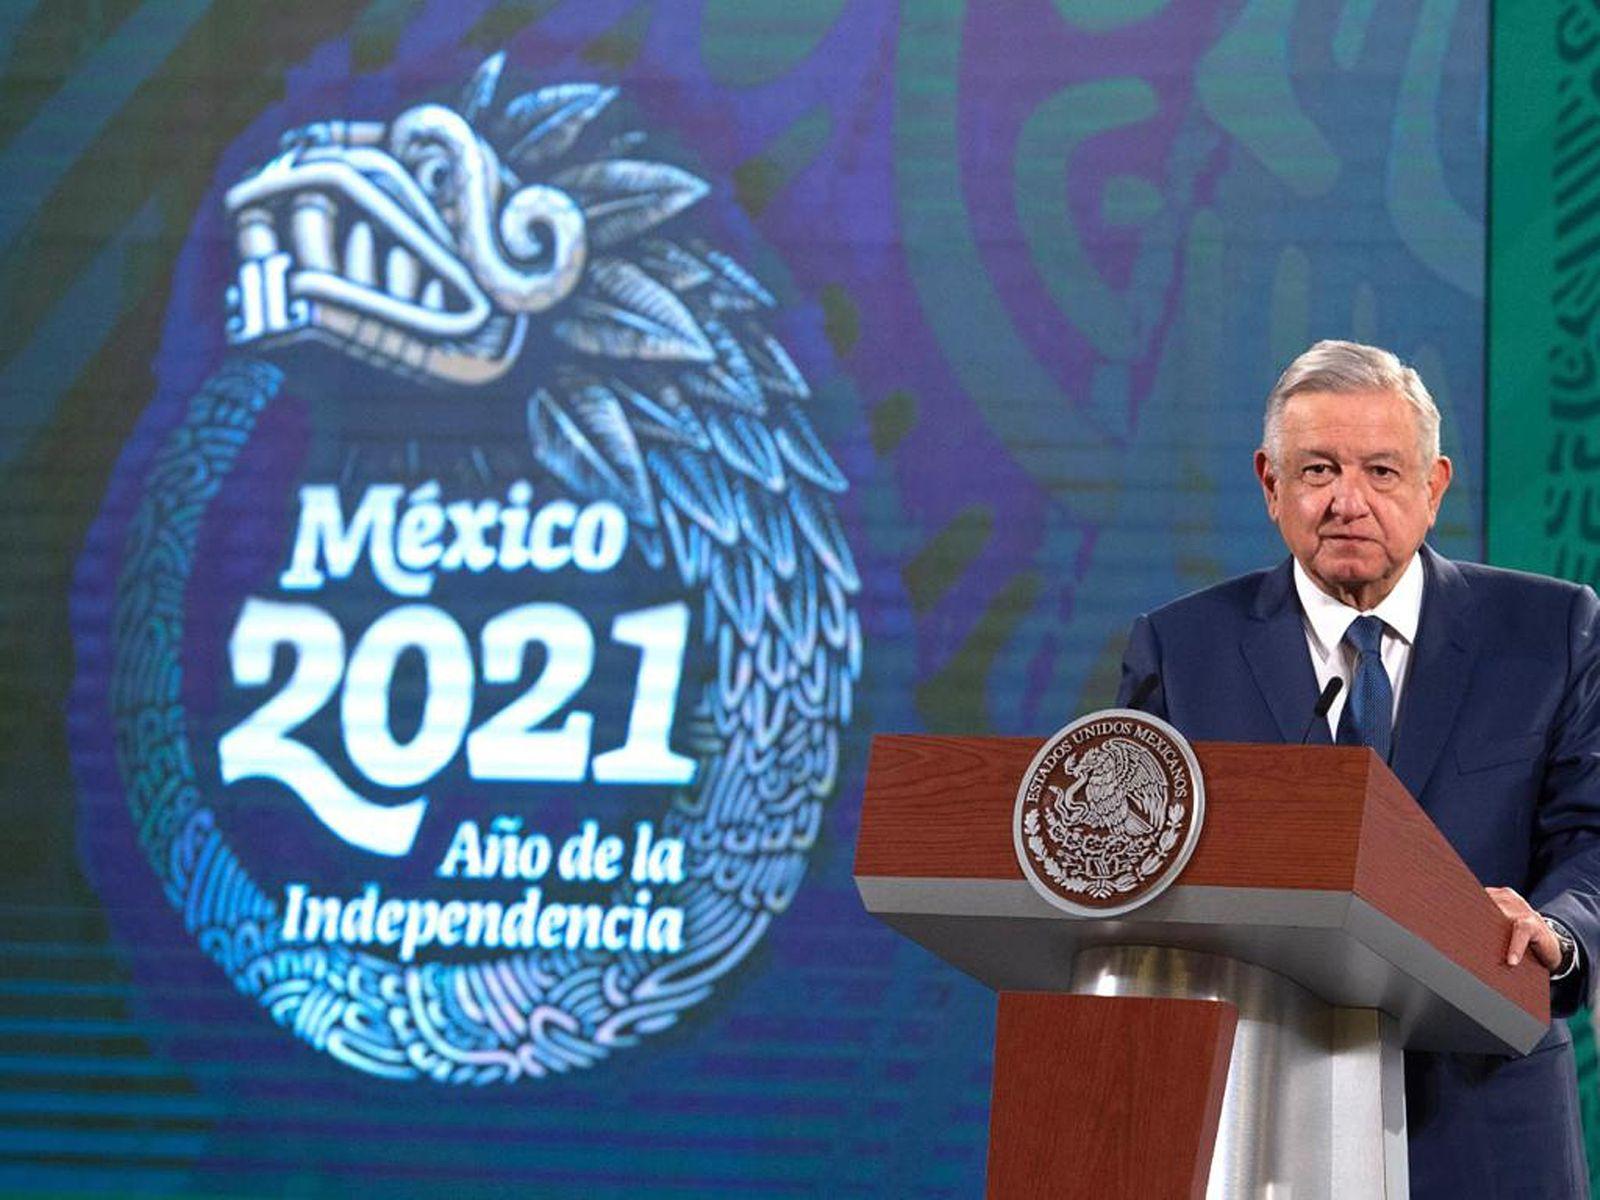 Mexican President Andres Manuel Lopez Obrador press conference, Mexico City - 06 Jan 2021